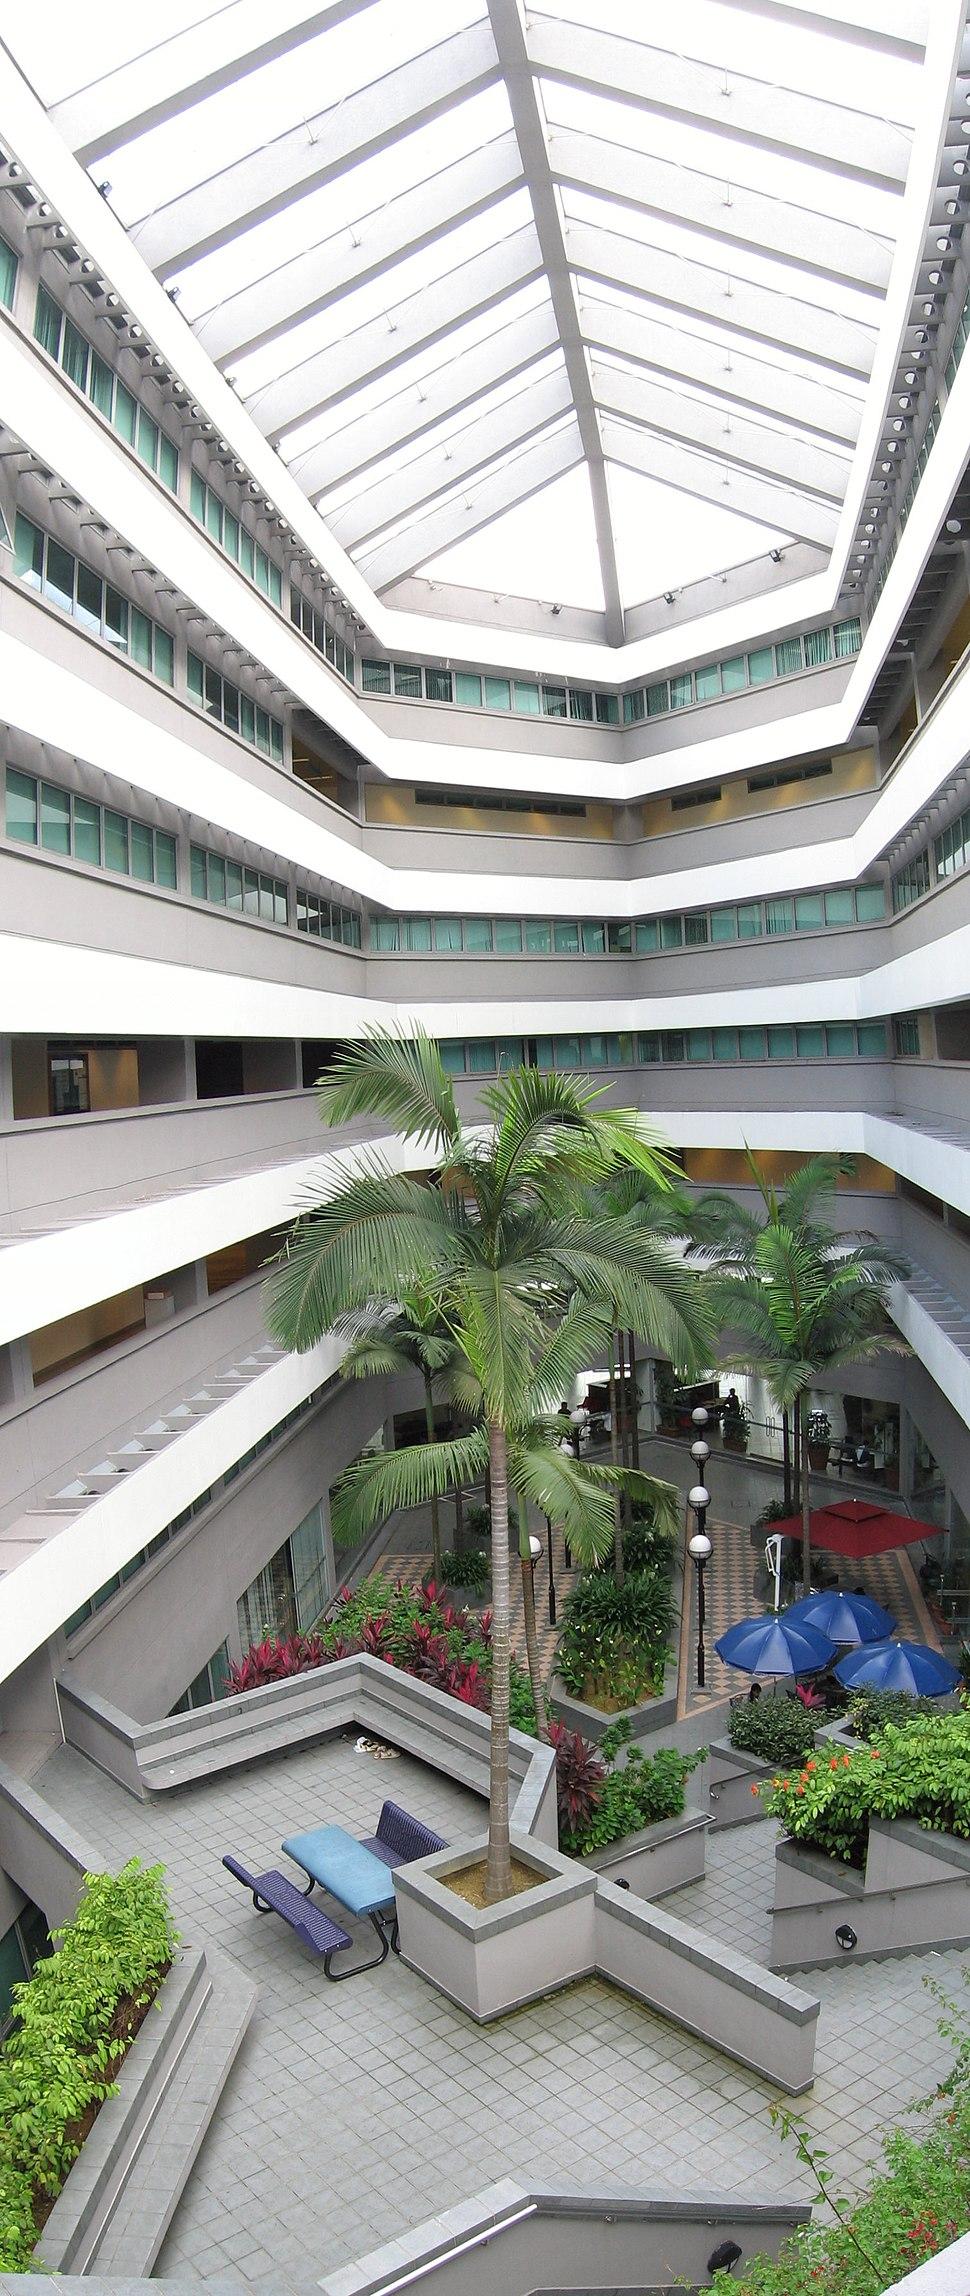 National University of Singapore, Faculty of Engineering, panorama, Nov 06